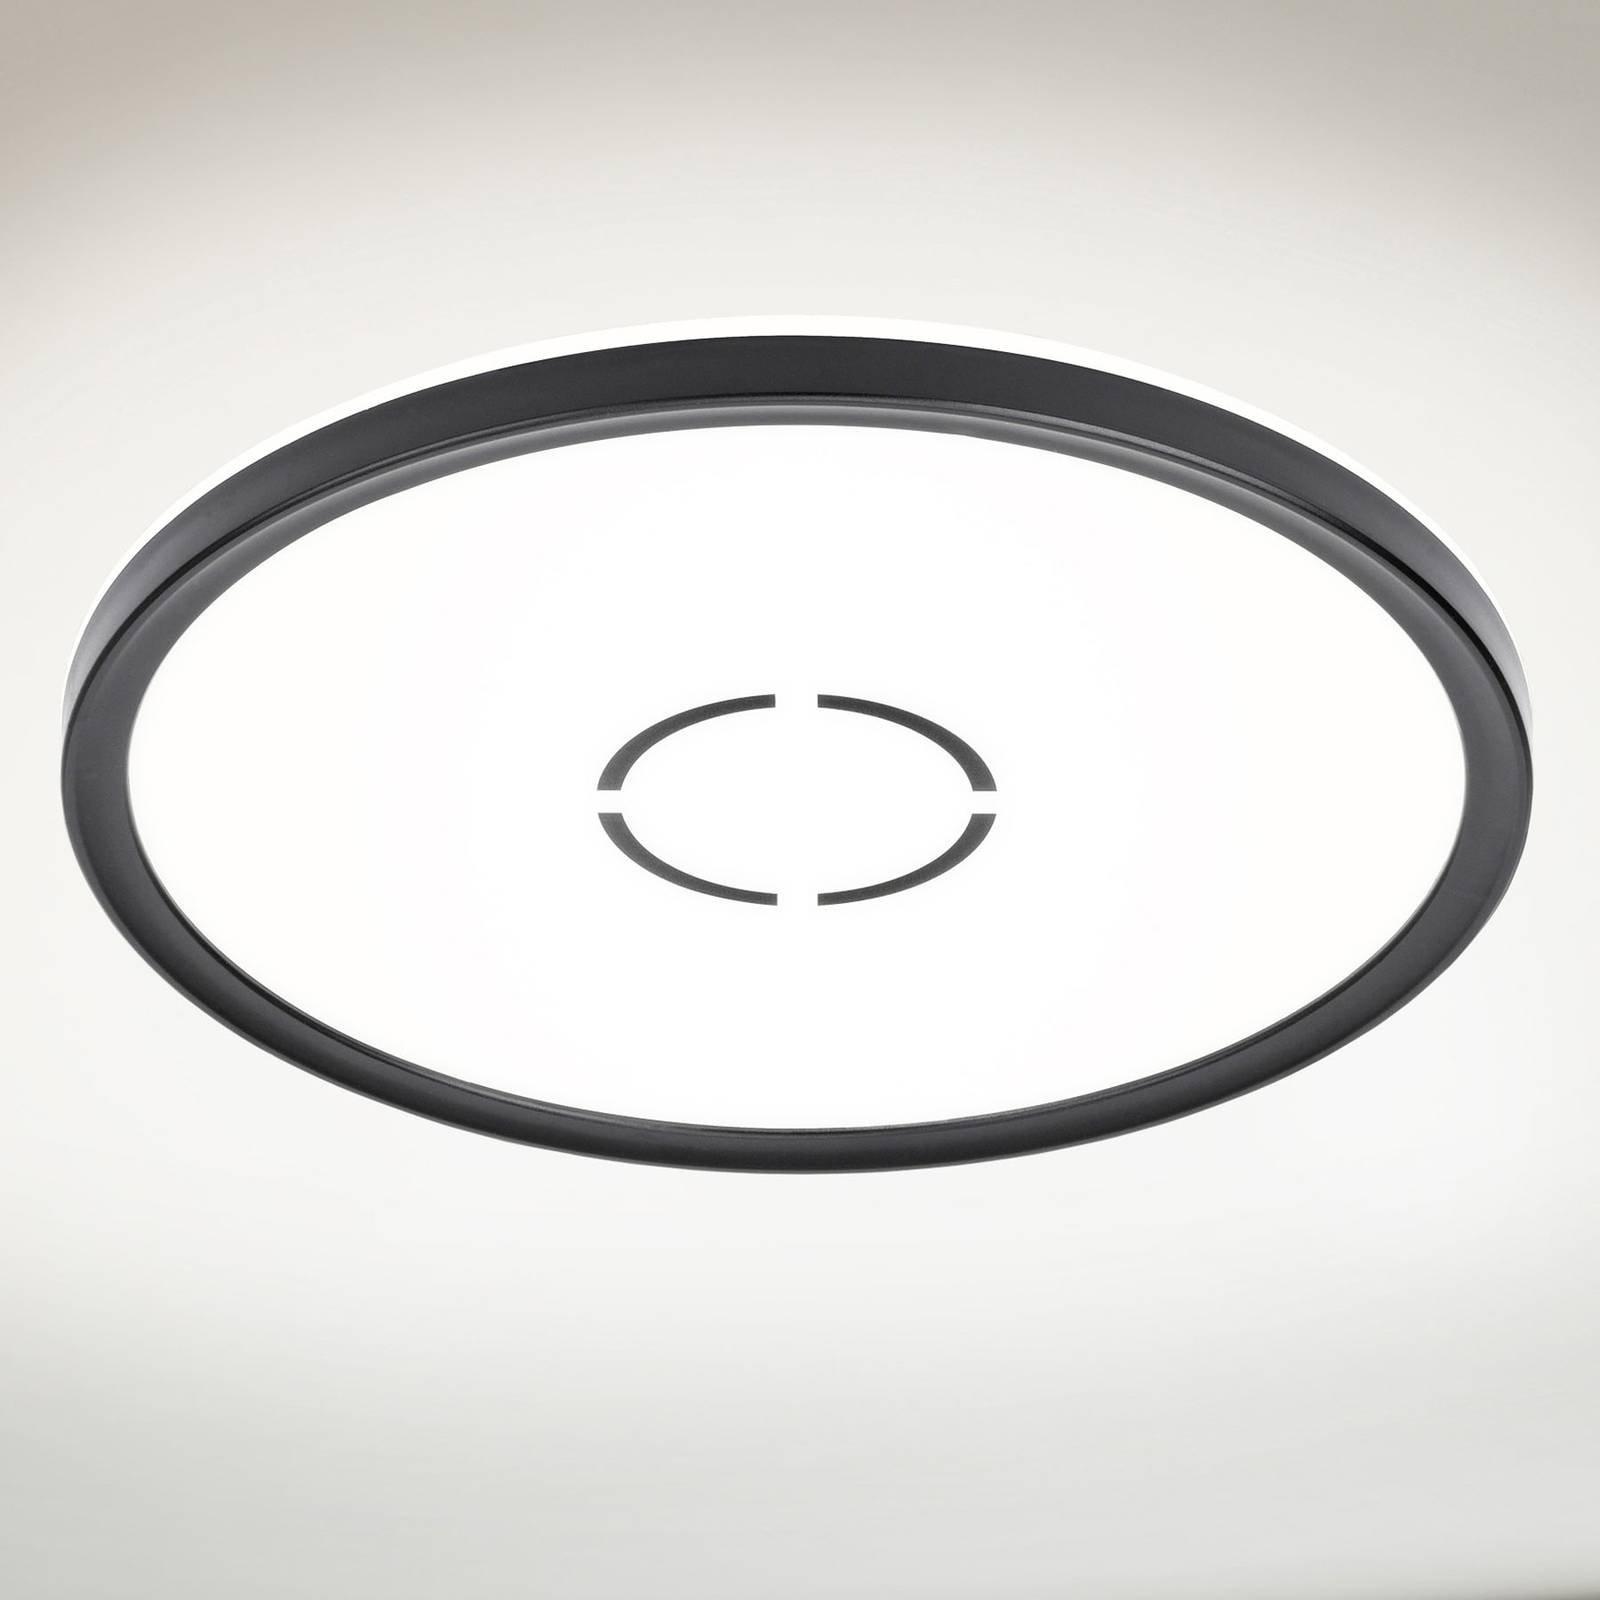 LED-taklampe Free Ø 29 cm svart